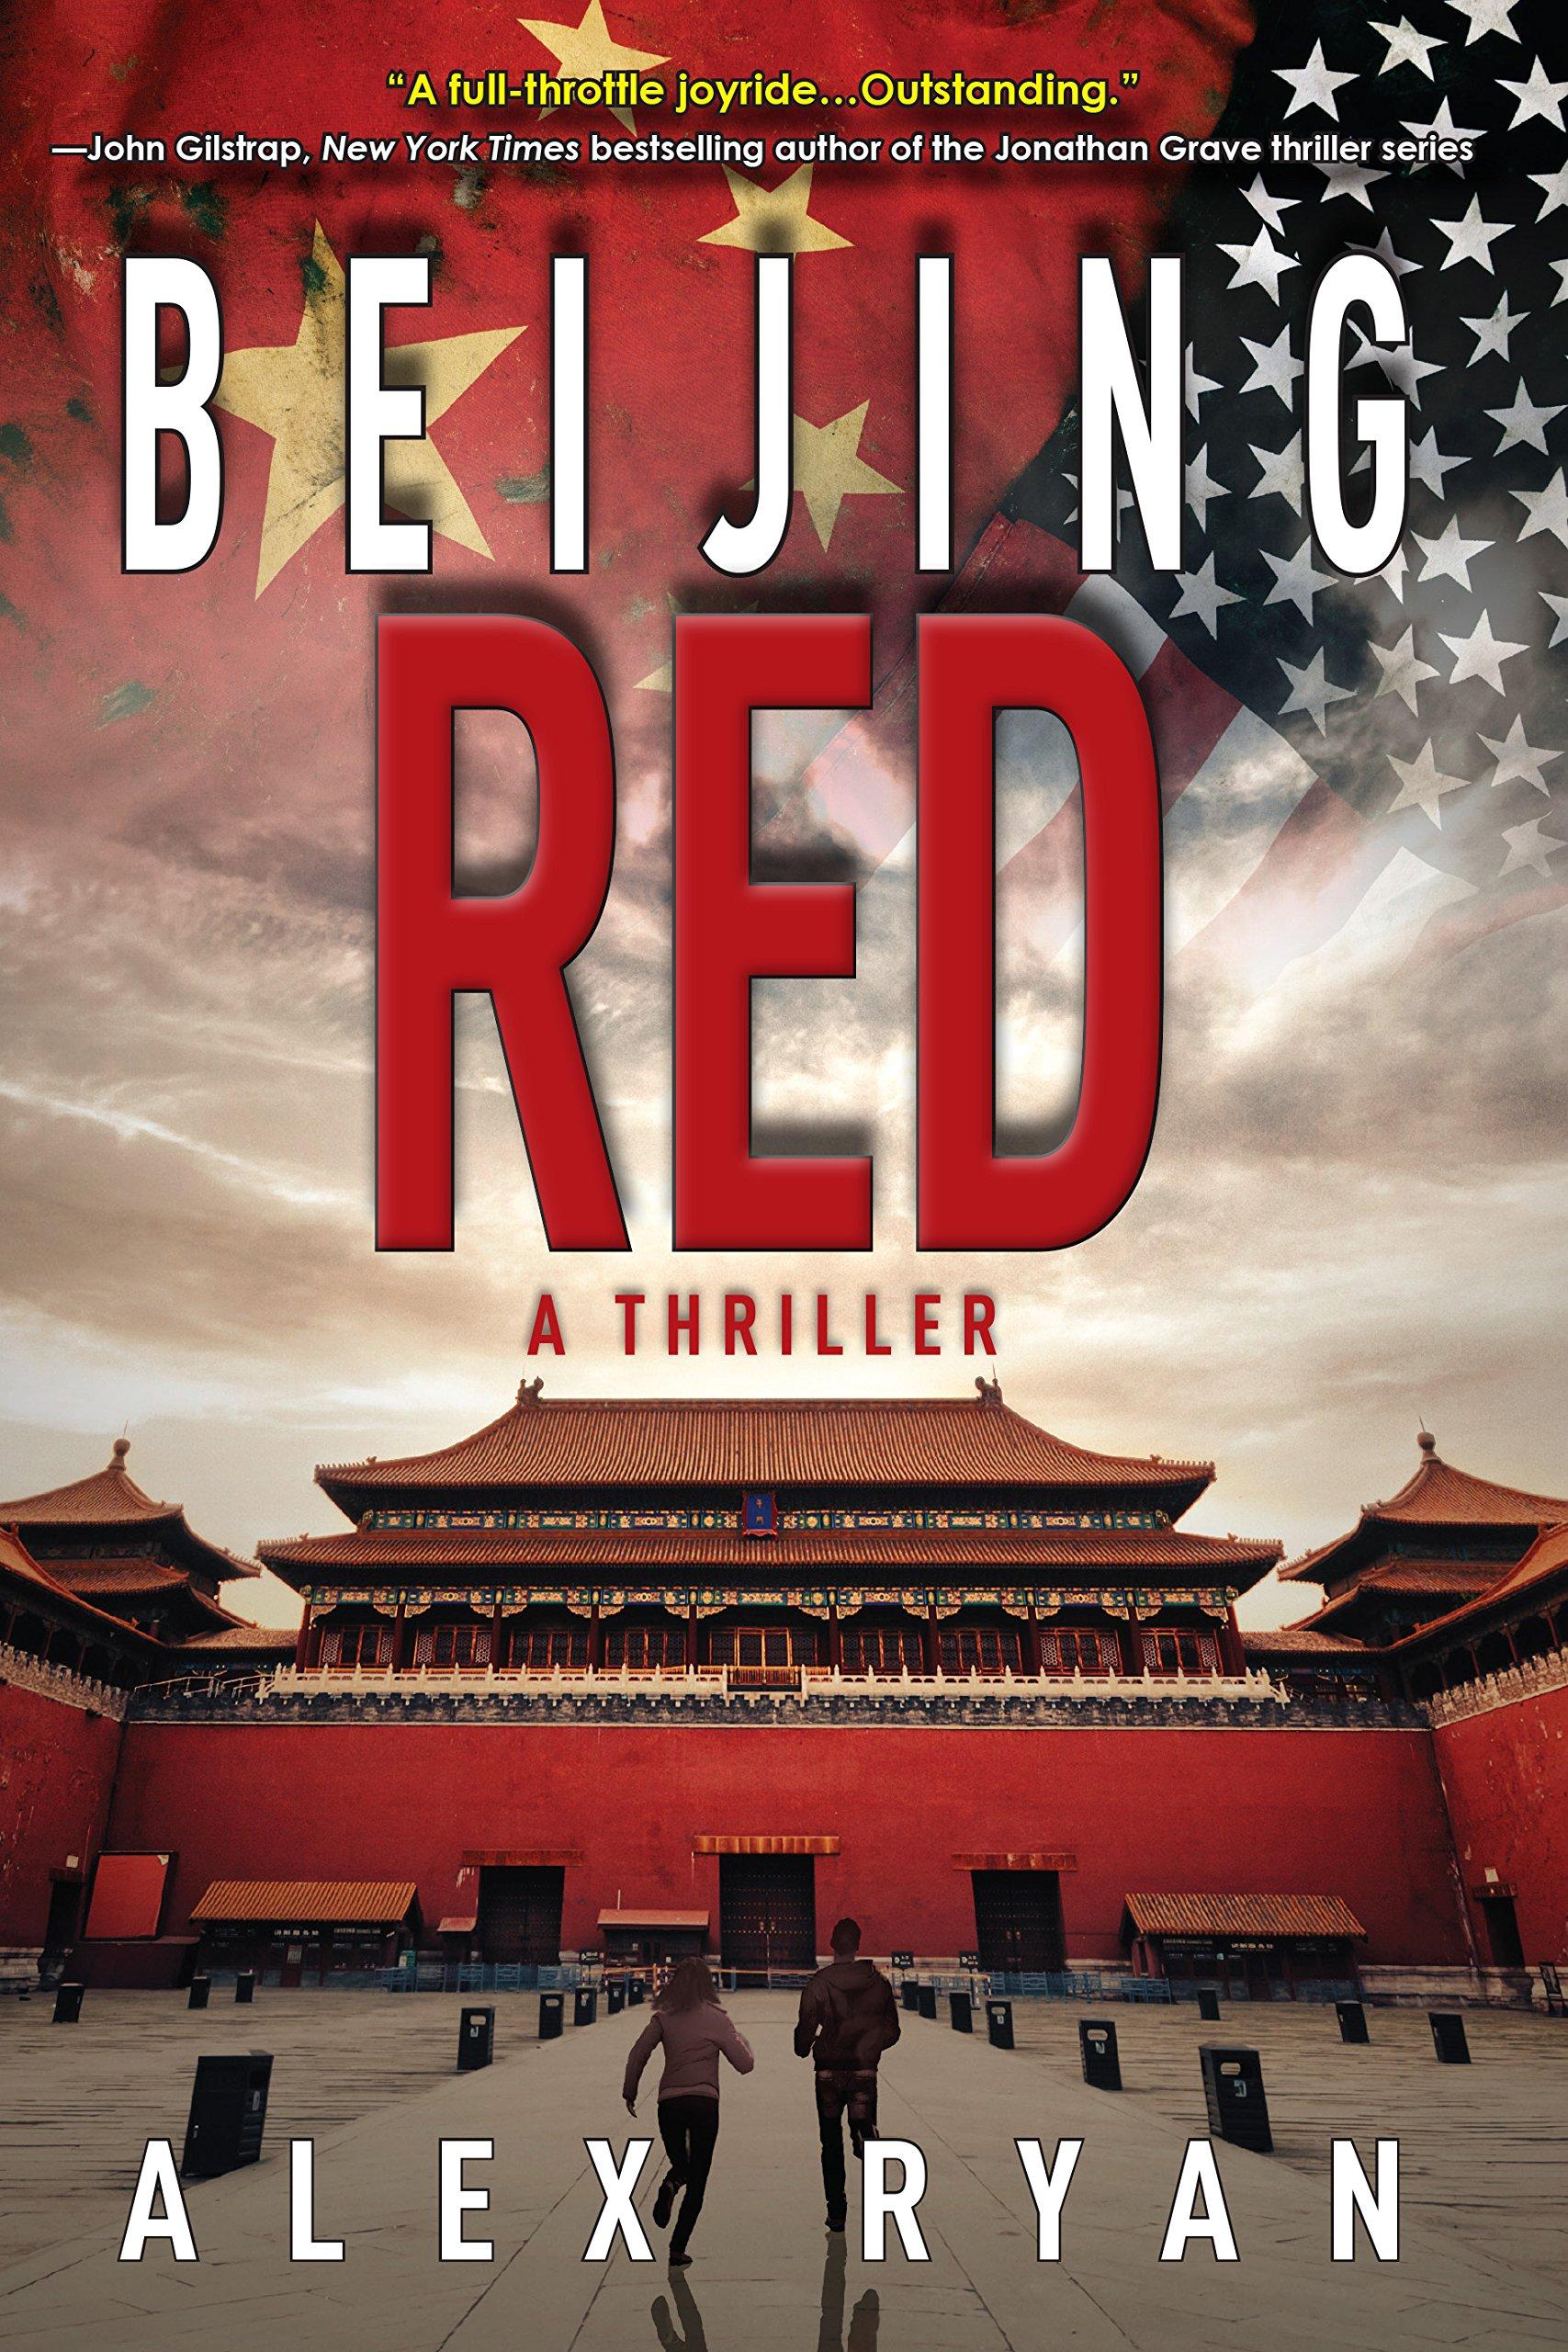 Beijing Red: A Thriller (A Nick Foley Thriller): Amazon.co.uk: Alex Ryan:  9781629535944: Books